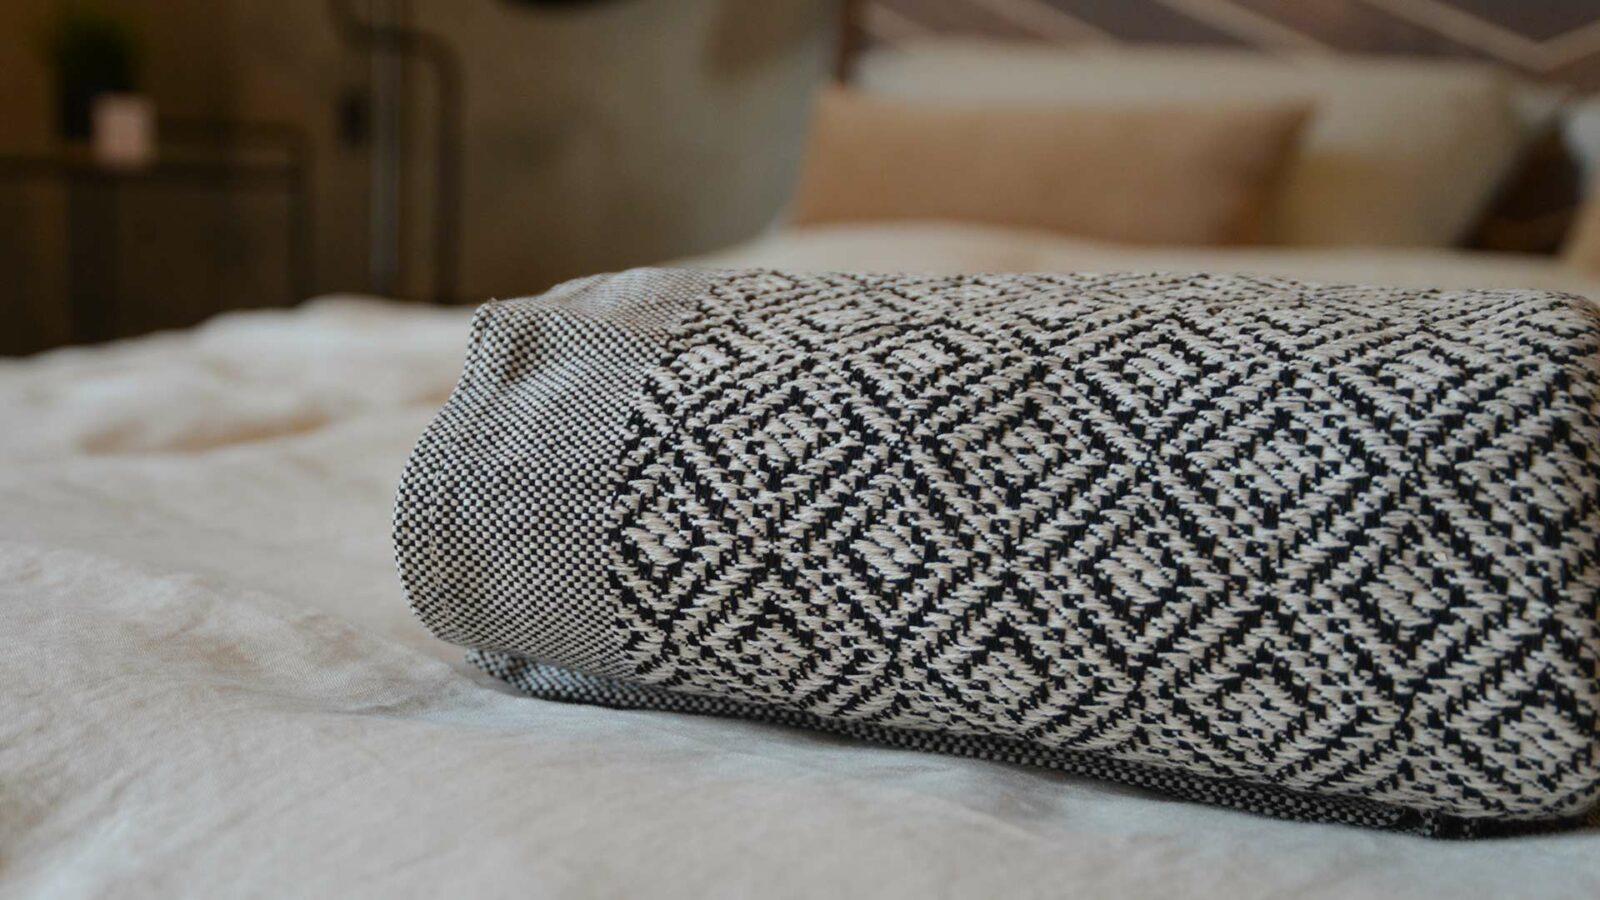 Black and white woven cotton bedspread